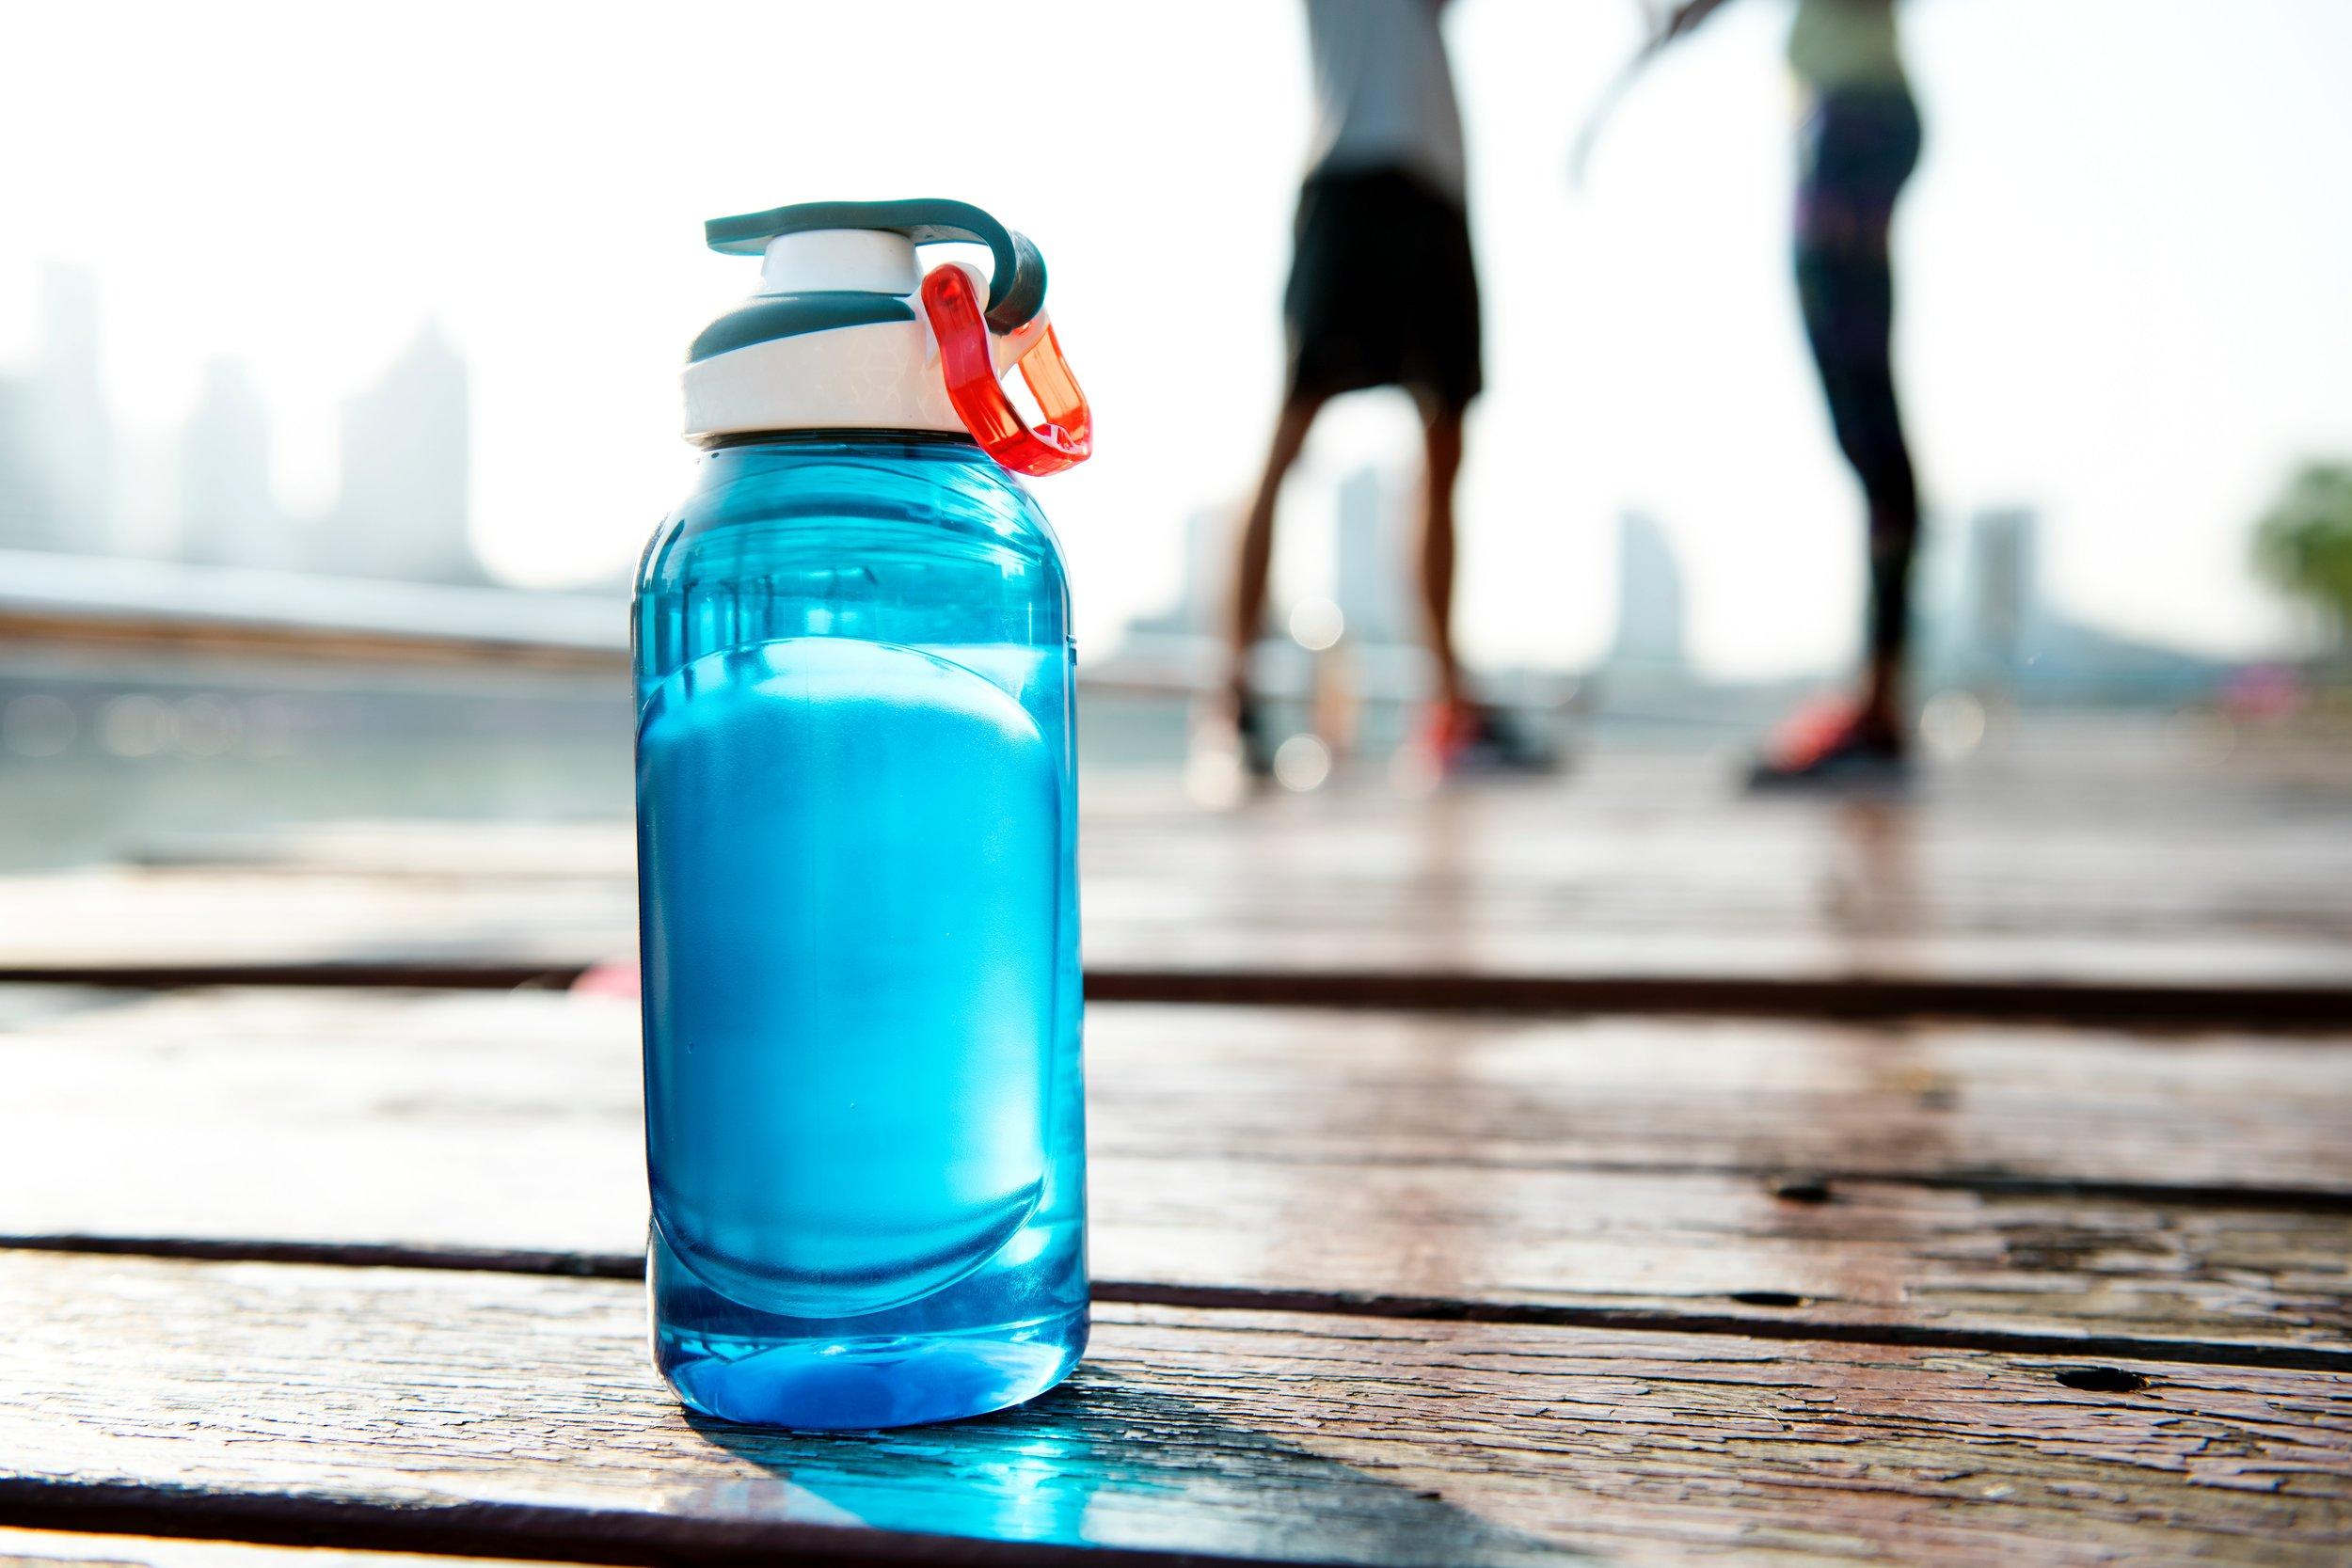 active-blue-blurred-background-1842627.jpg